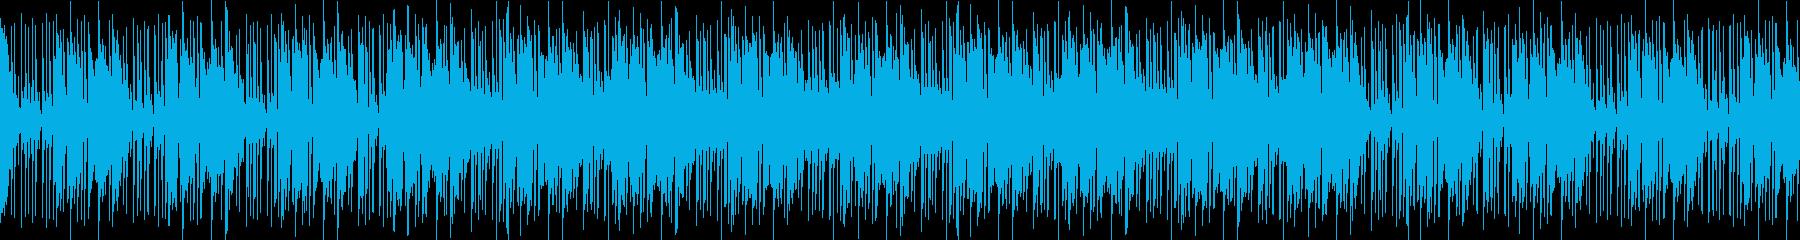 BPM93の民族系スローダウンテクノの再生済みの波形